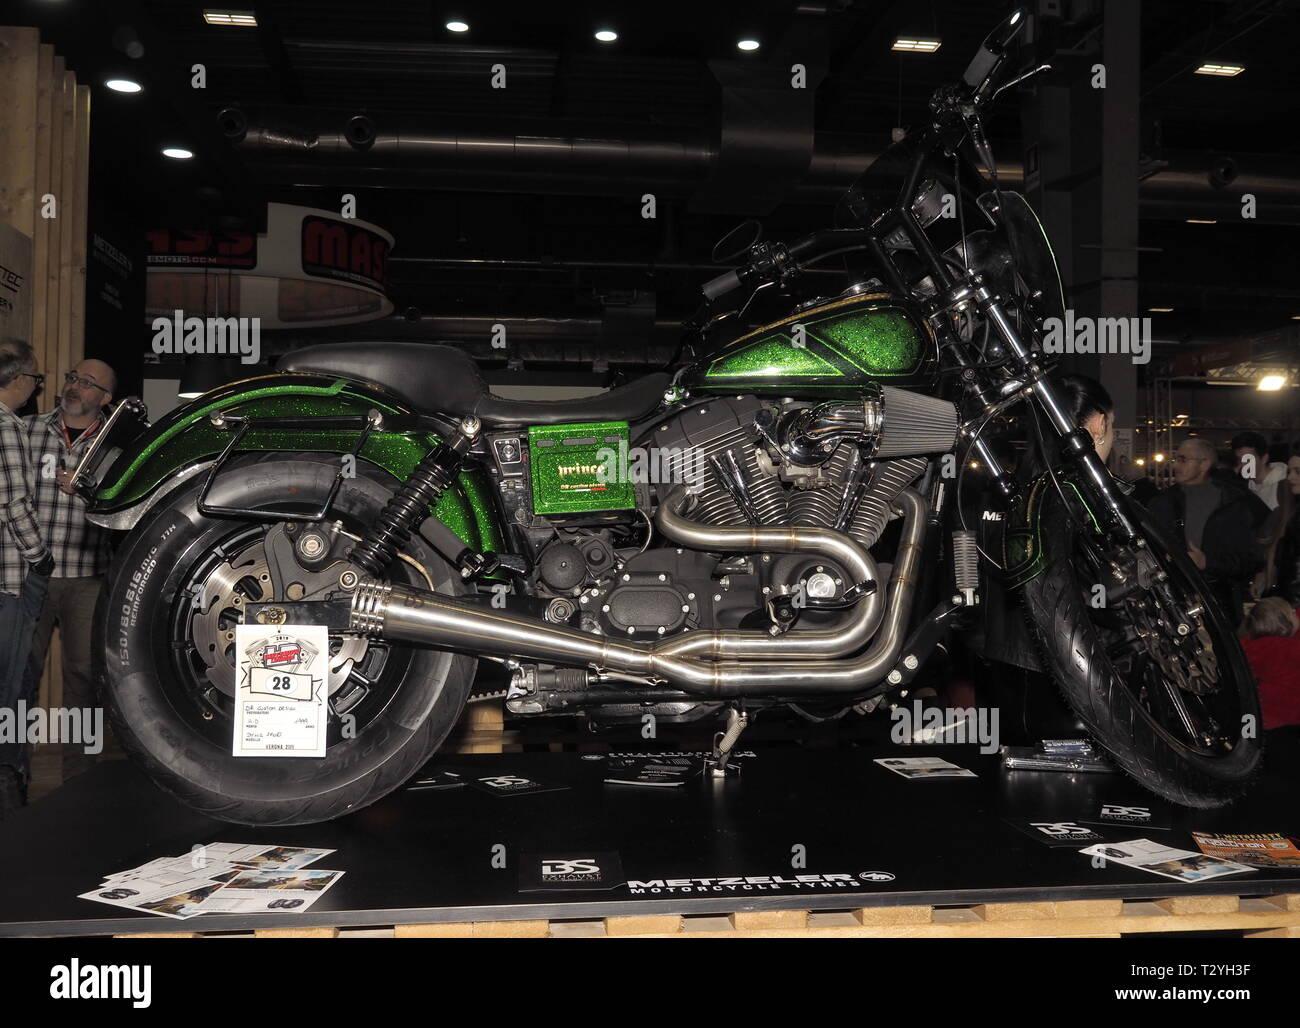 Verona, Italia: 19 de enero de 2019: Motor bike expo Verona 2019 Imagen De Stock